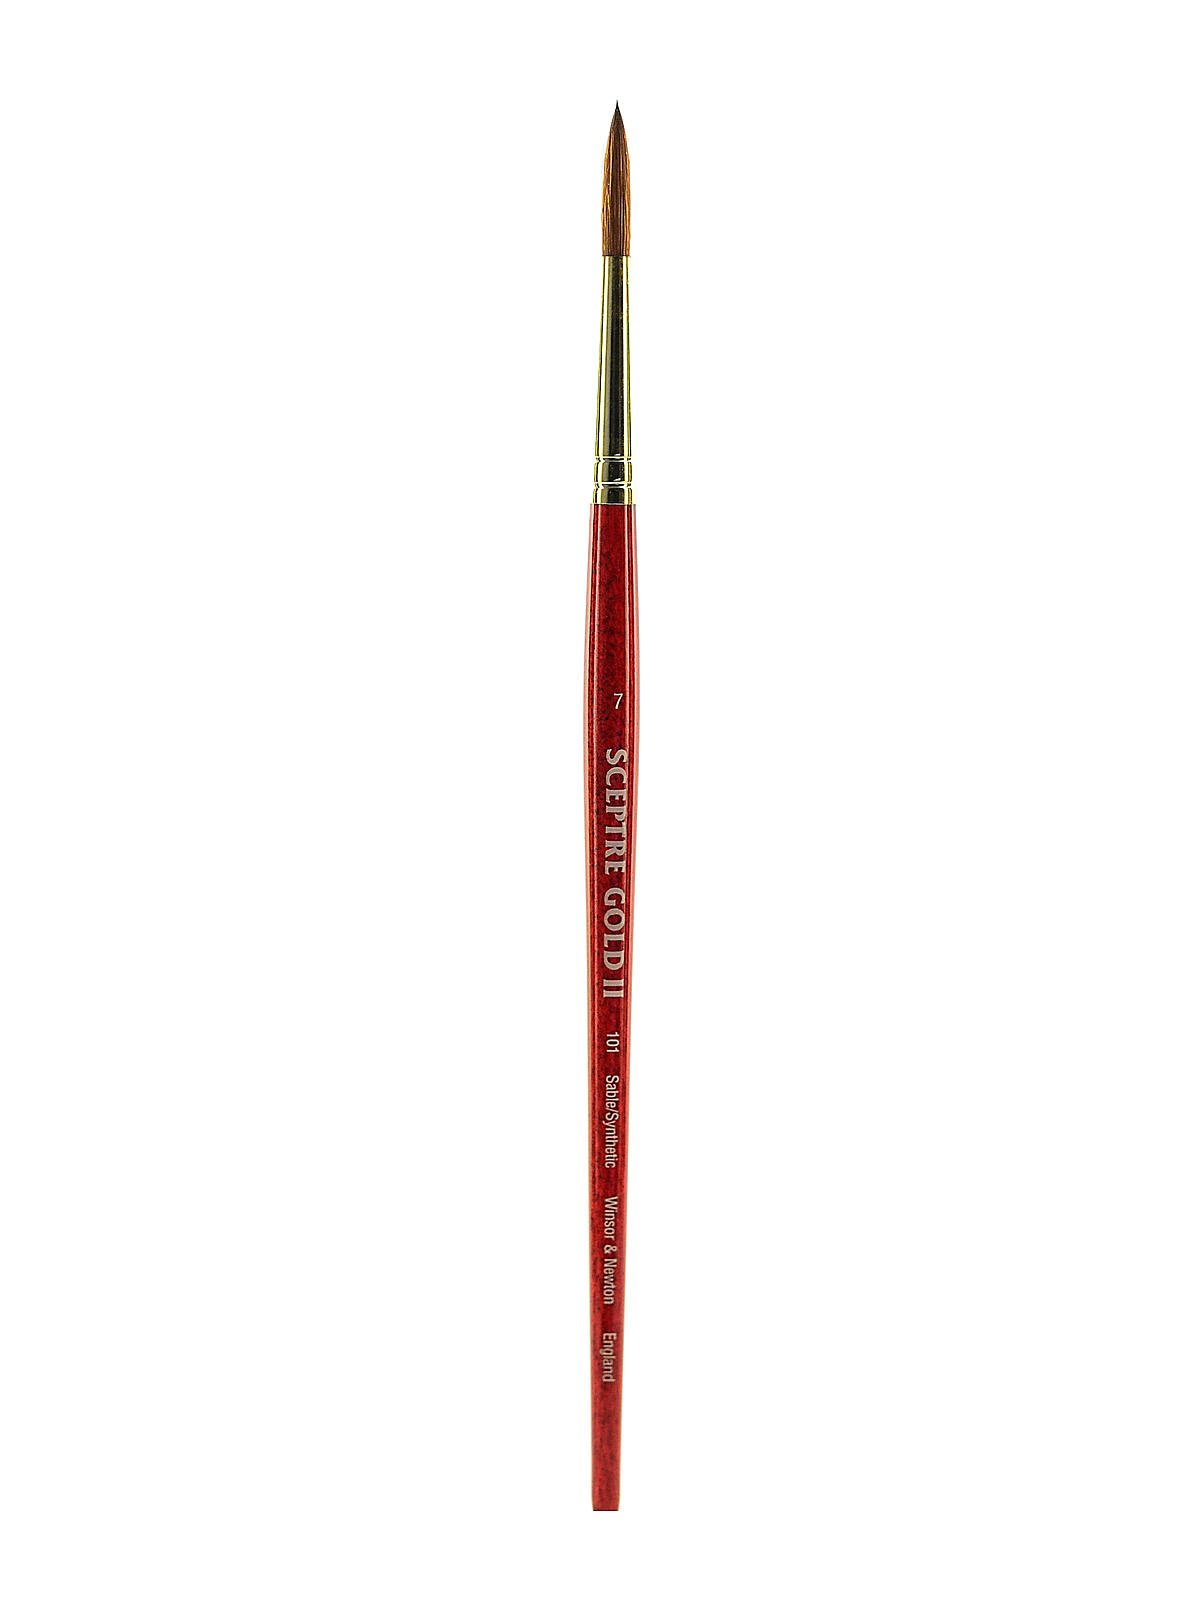 Winsor and Newton Sceptre Gold II Brush Round-Short Handle 7